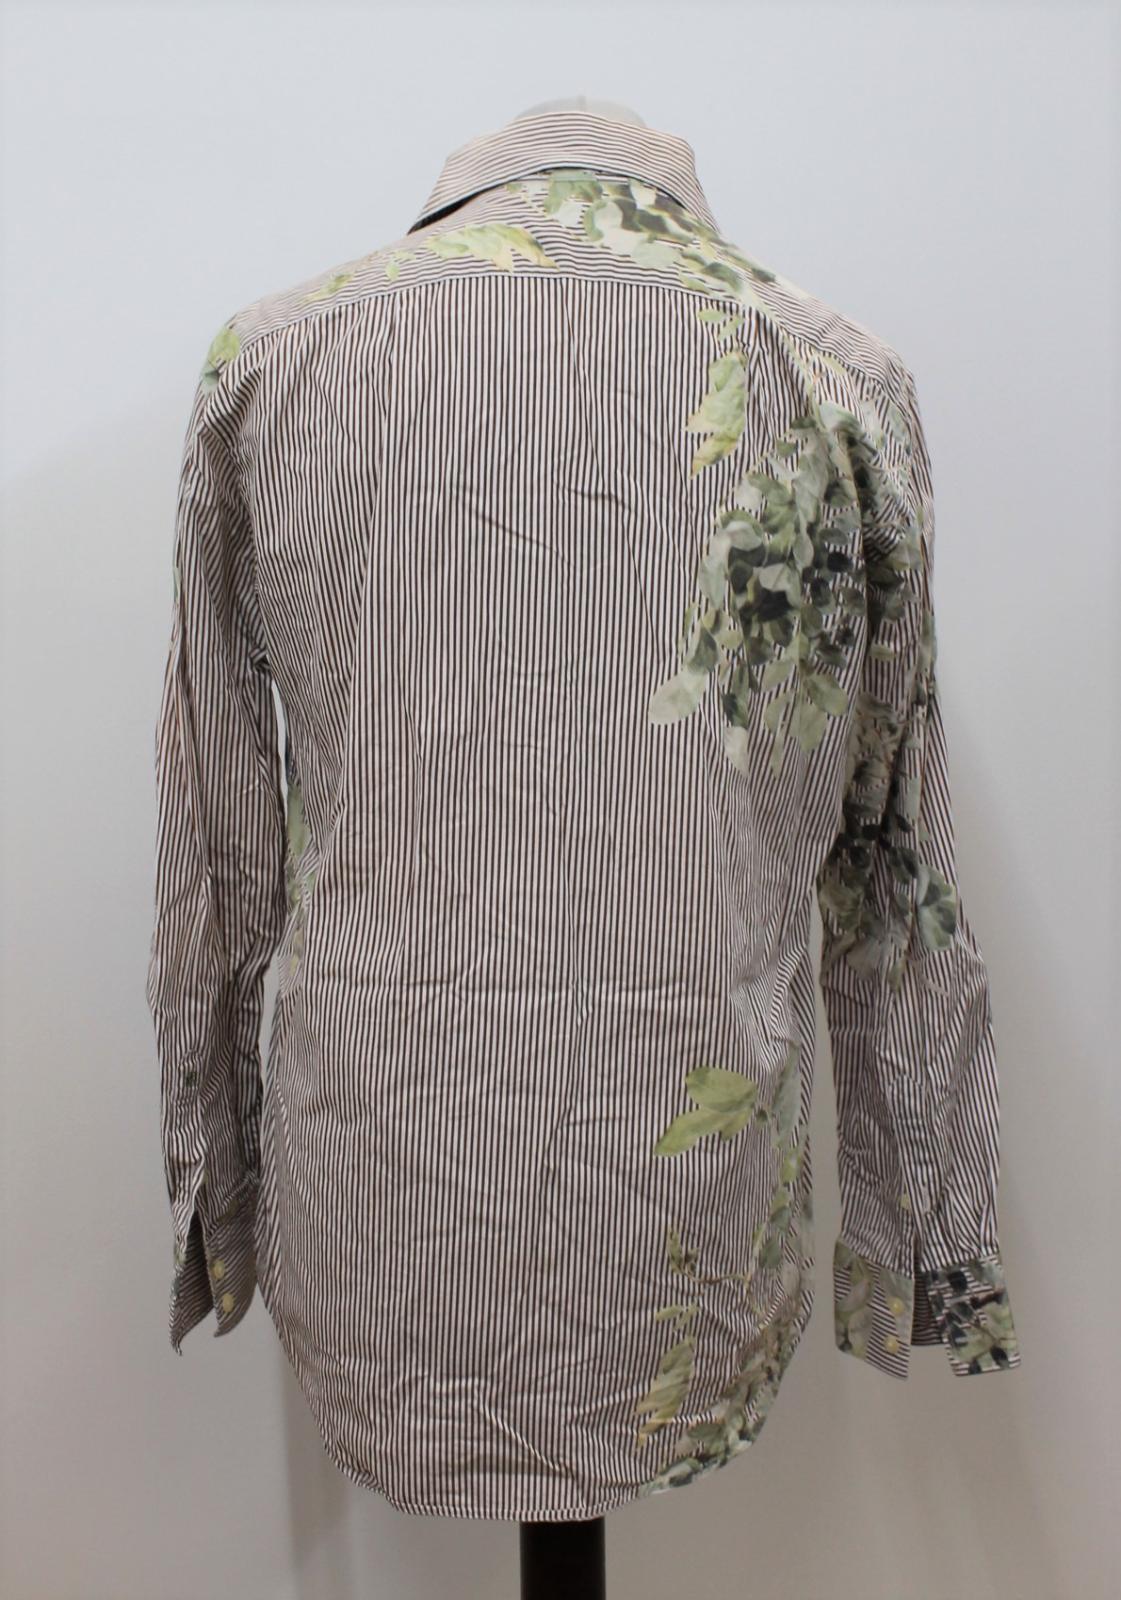 Paul-Smith-Para-Hombre-Marron-Verde-A-Rayas-Manga-Larga-de-impresion-de-hojas-Algodon-Camisa-Tamano miniatura 6